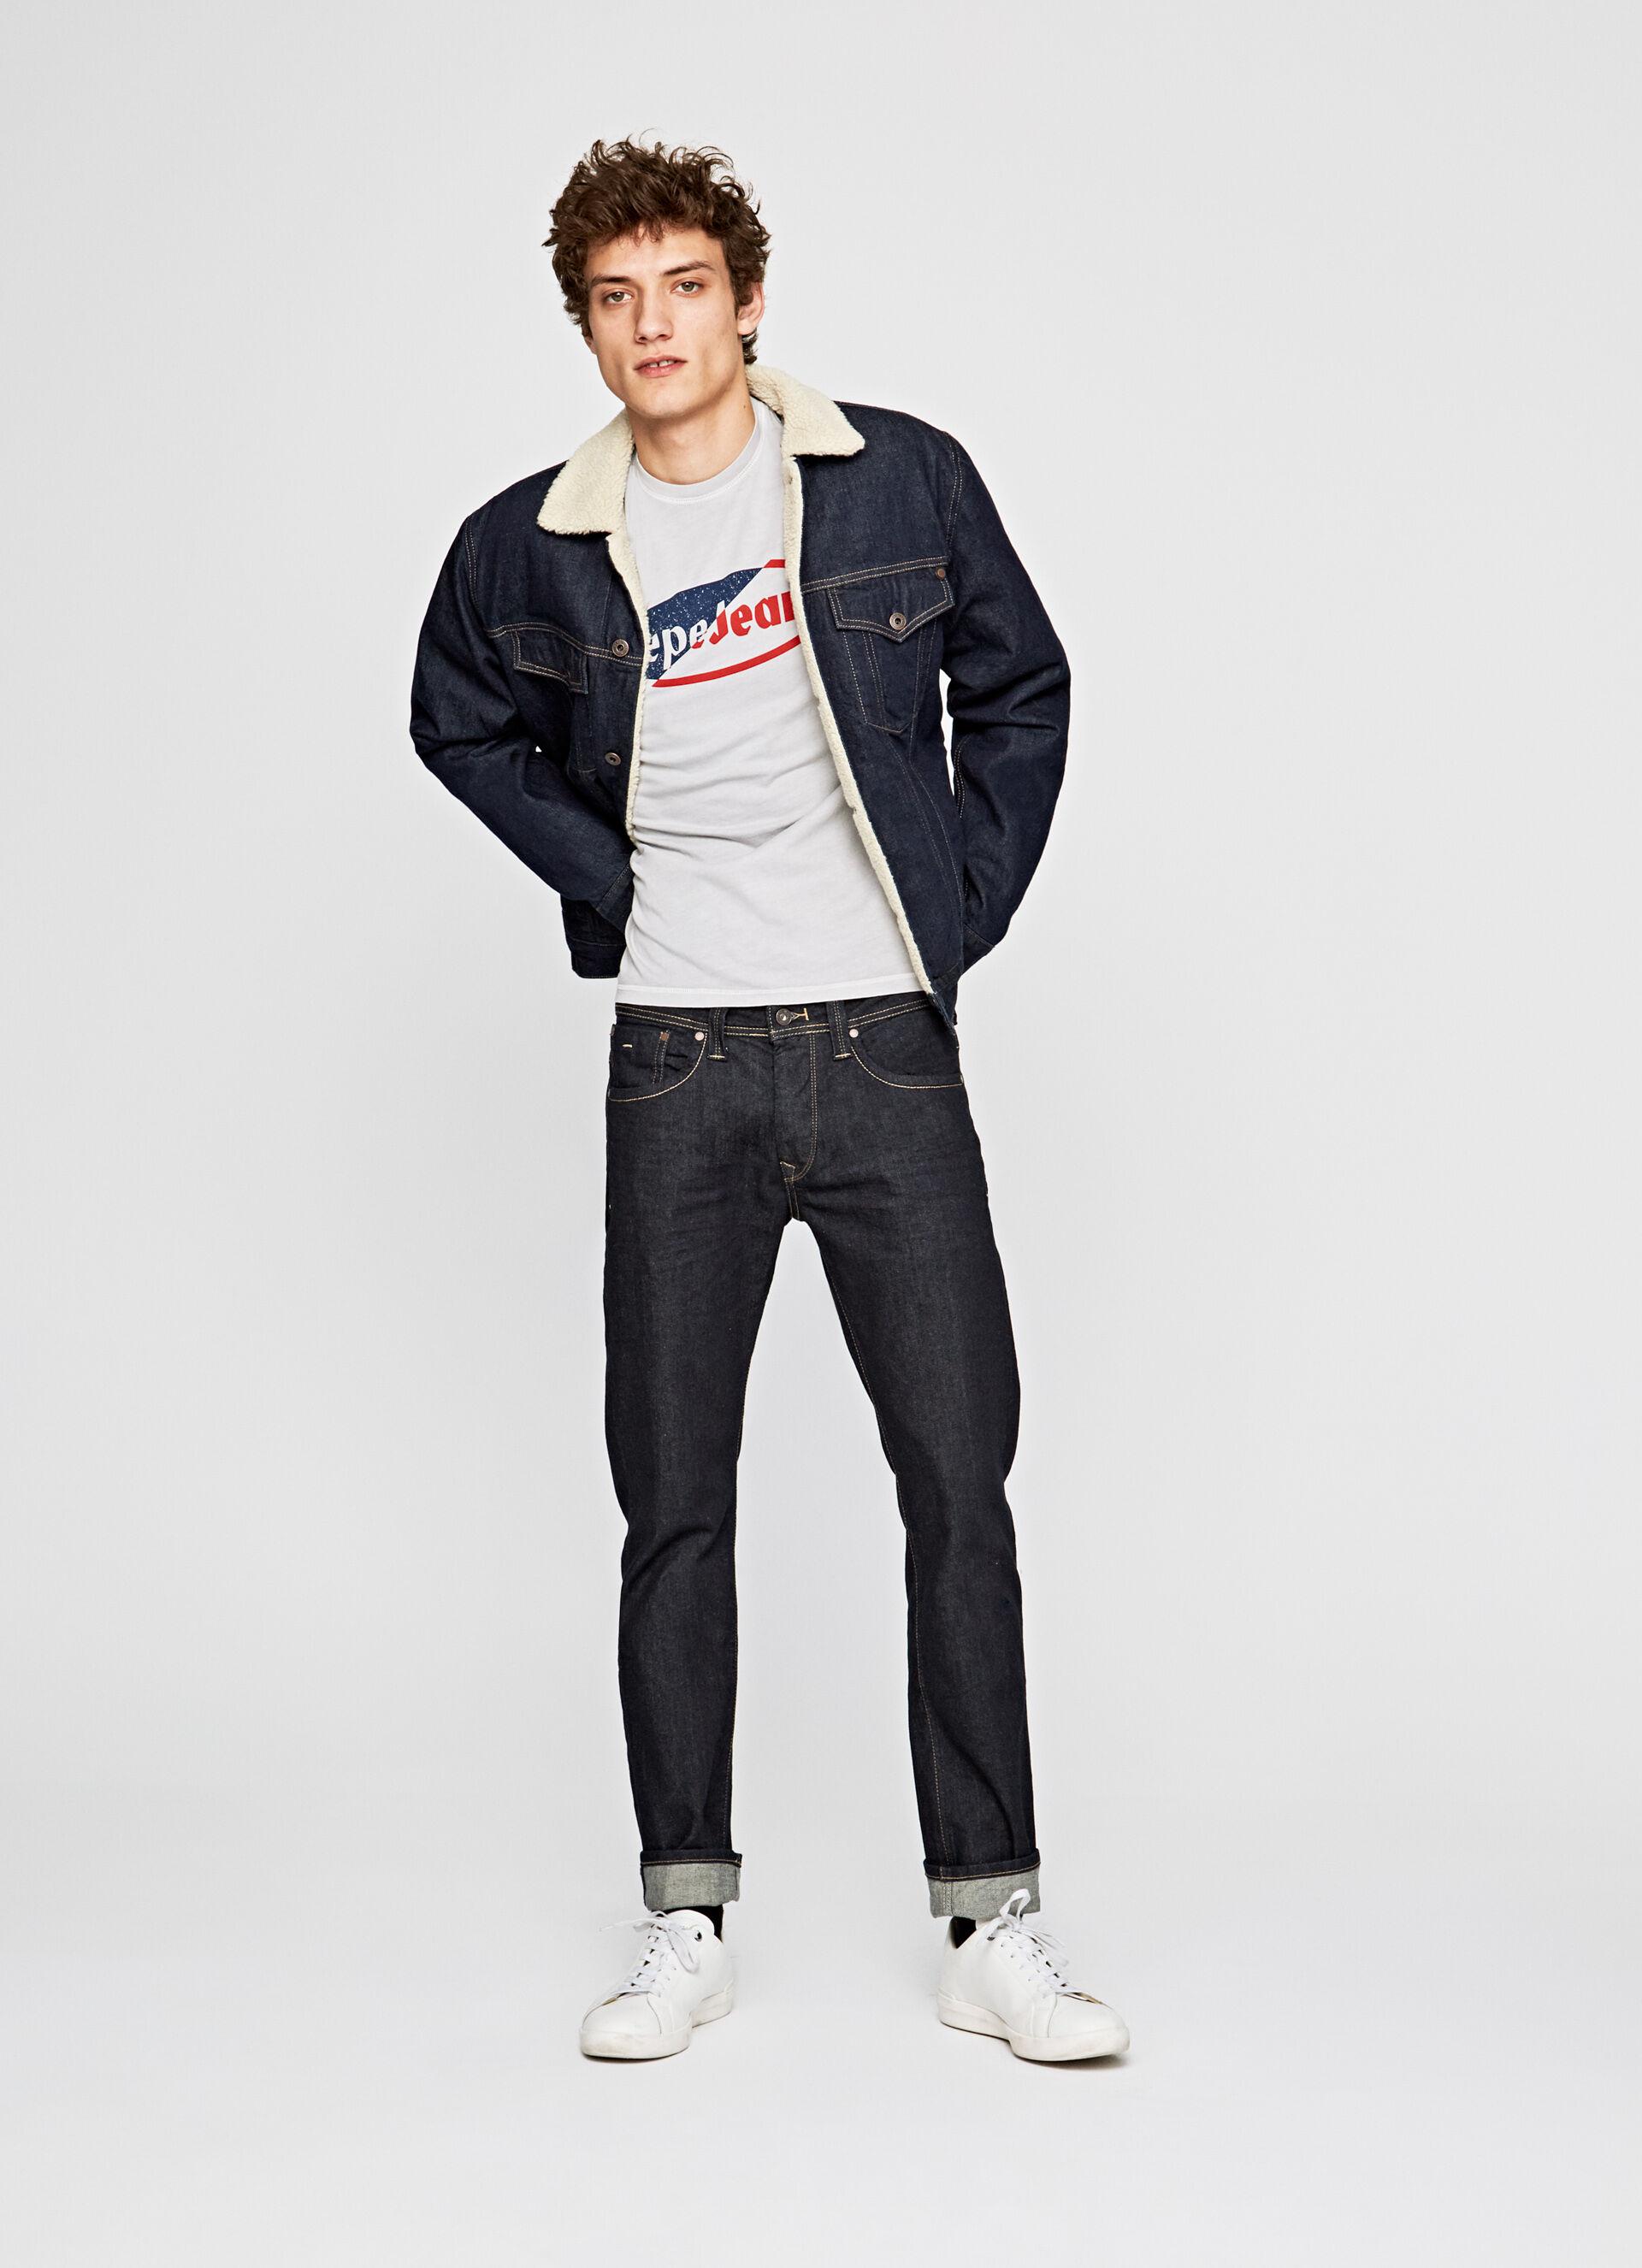 Pepe Jeans London Web Oficial España